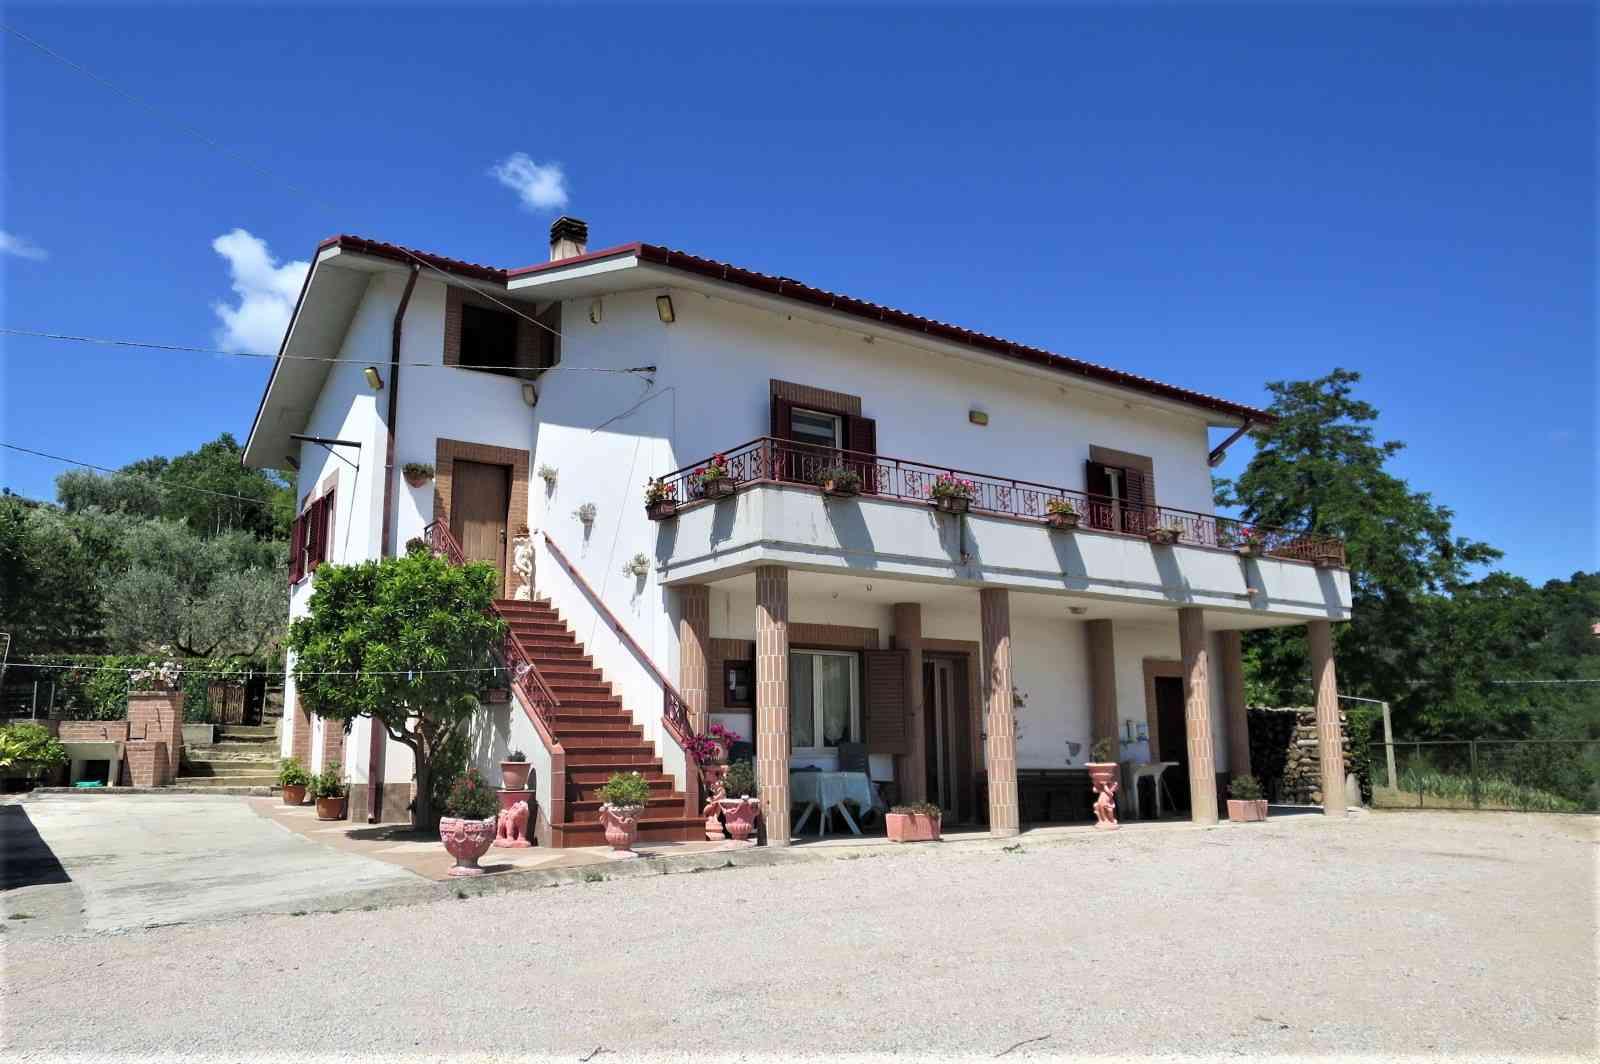 Casa di campagna Casa Clementina - Cellino Attanasio - GBP 195.962